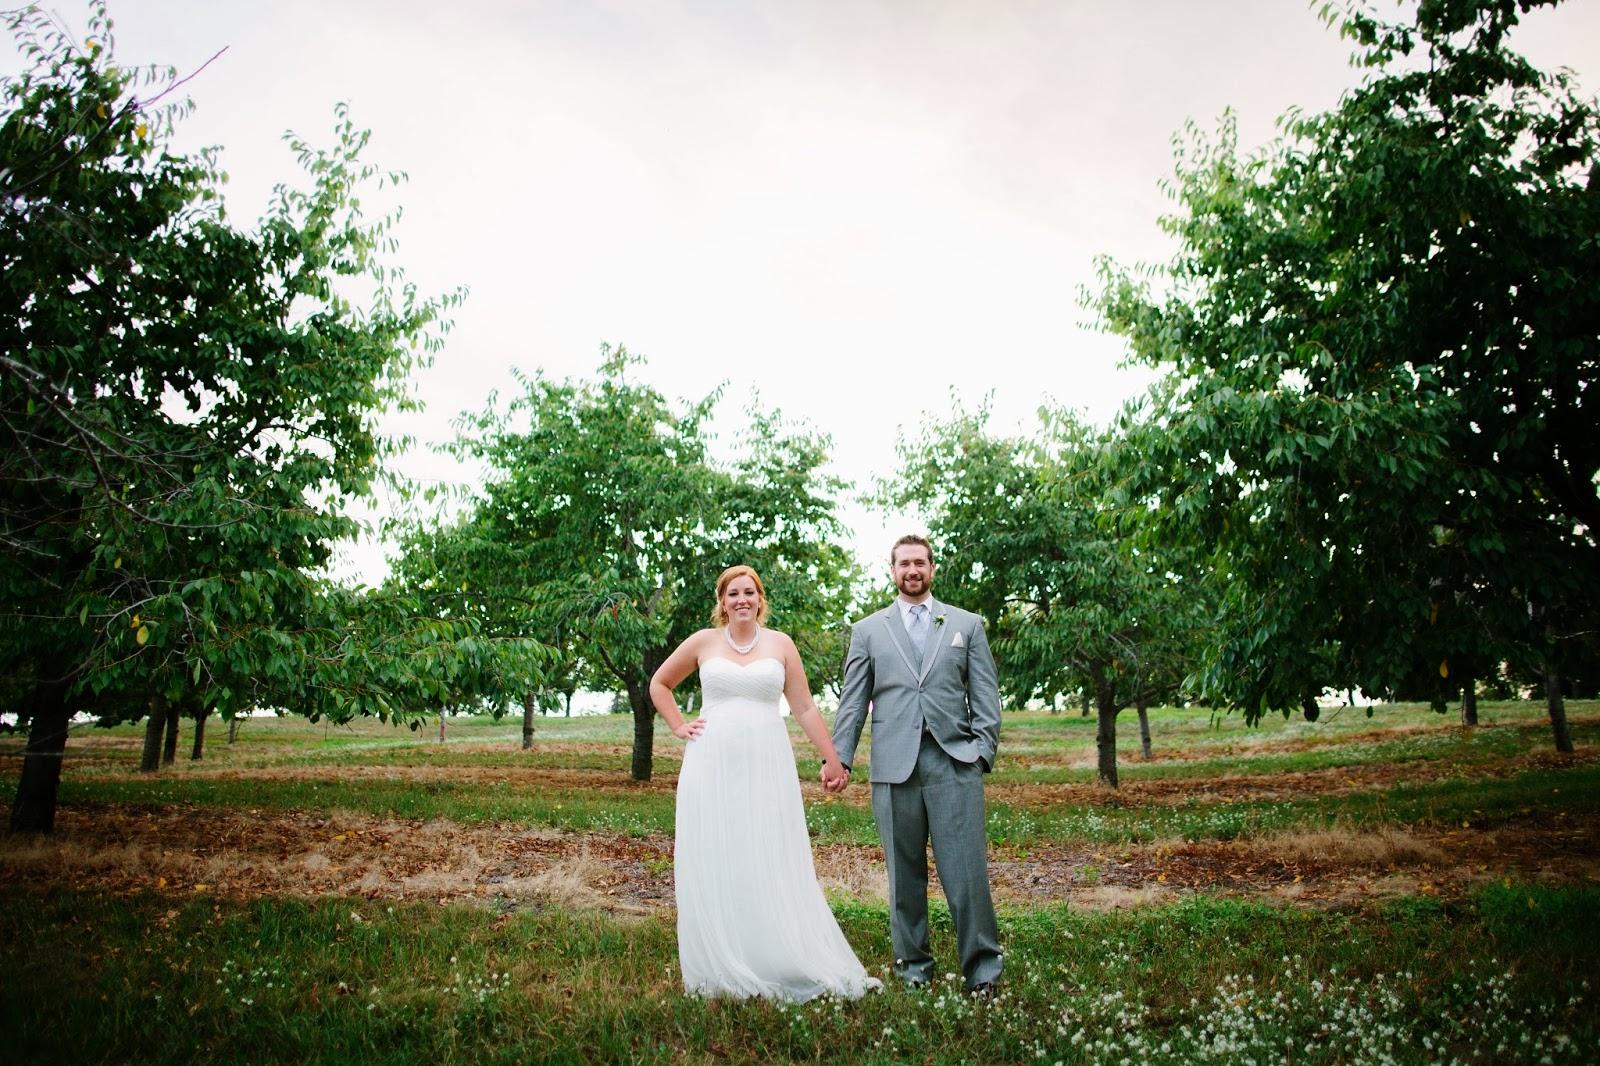 Field Of Flowers Wedding Michigan : The red headed spartan wedding